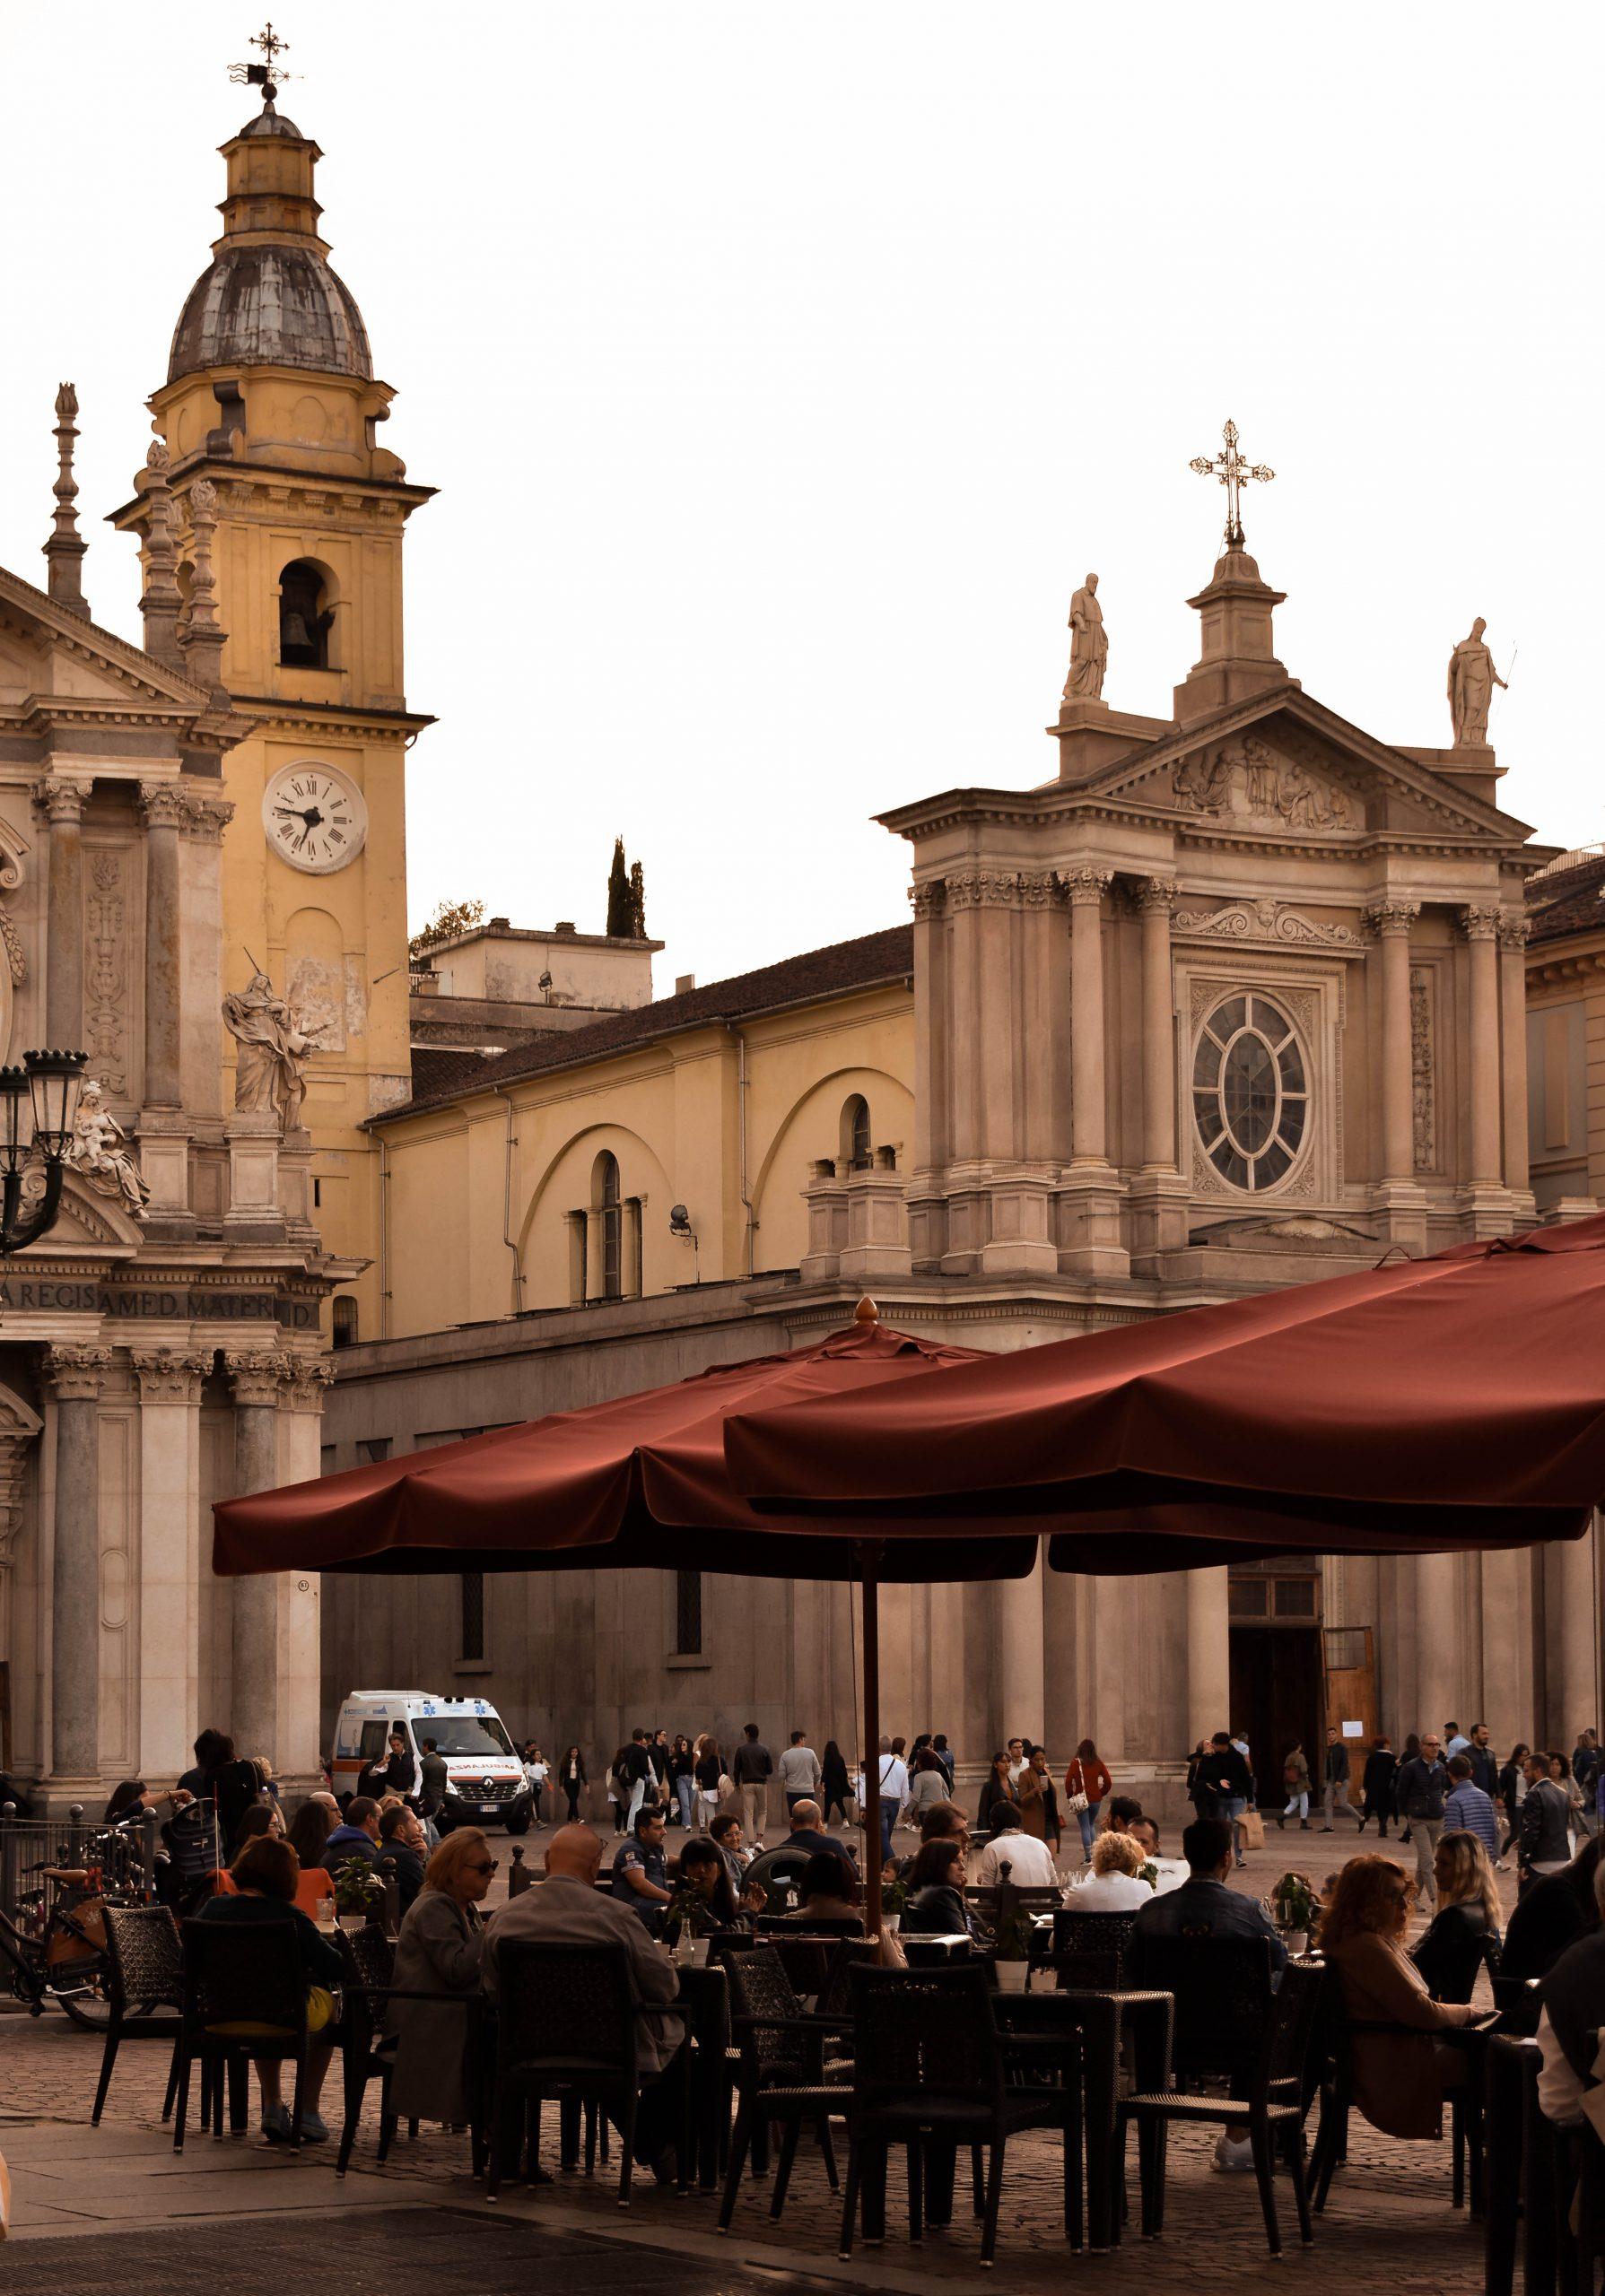 San Carlo Torino